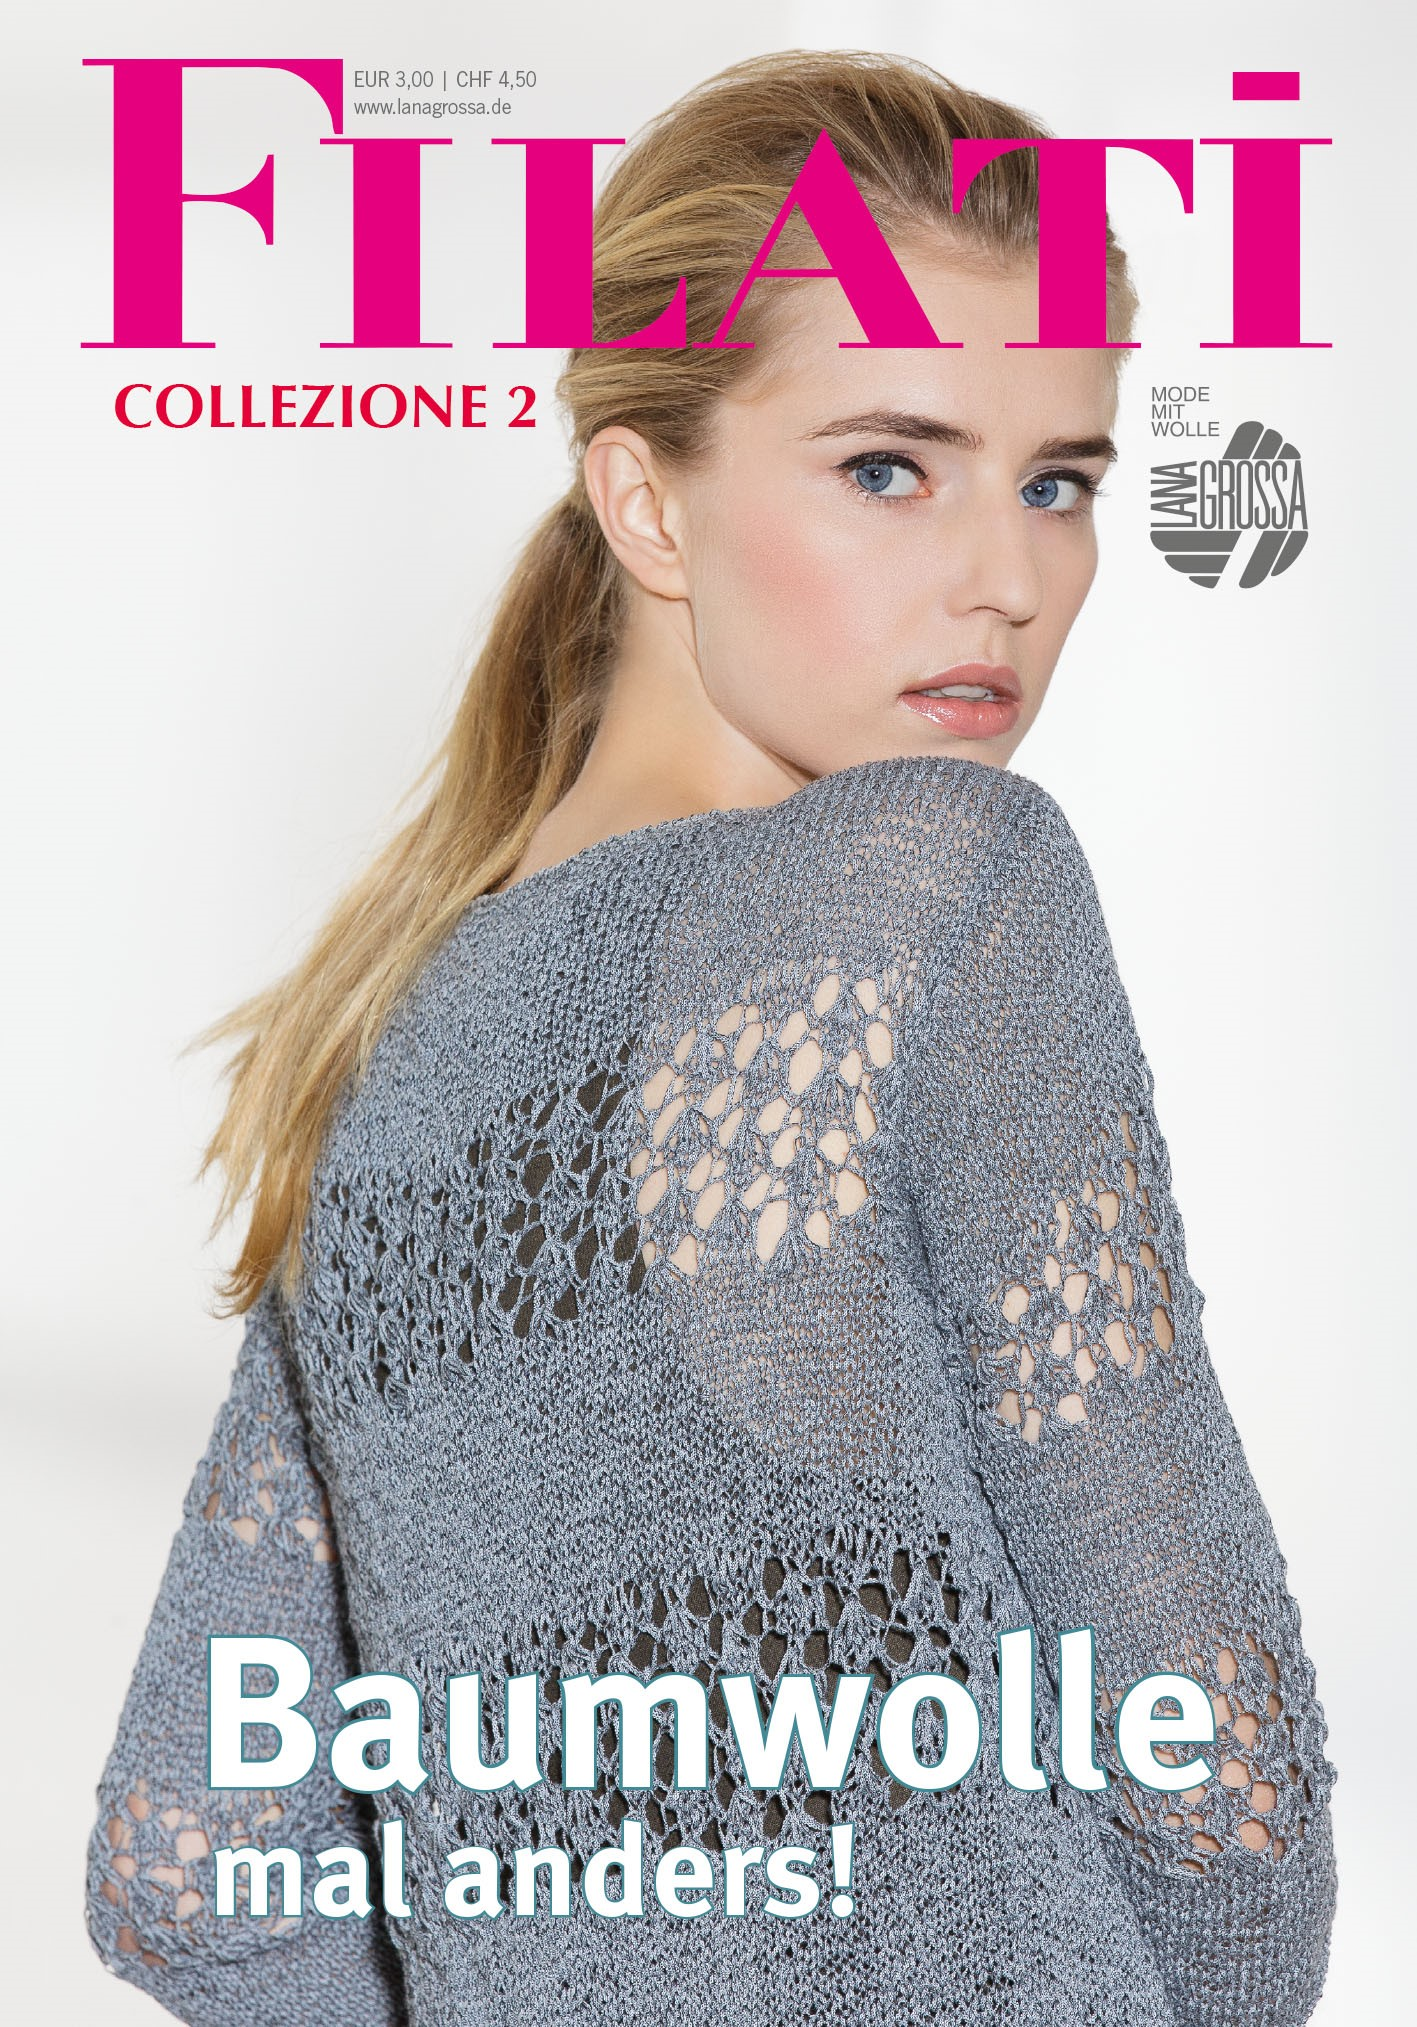 Lana Grossa FILATI COLLEZIONE No. 2 - Журнал на немецком и на русском языке инструкции